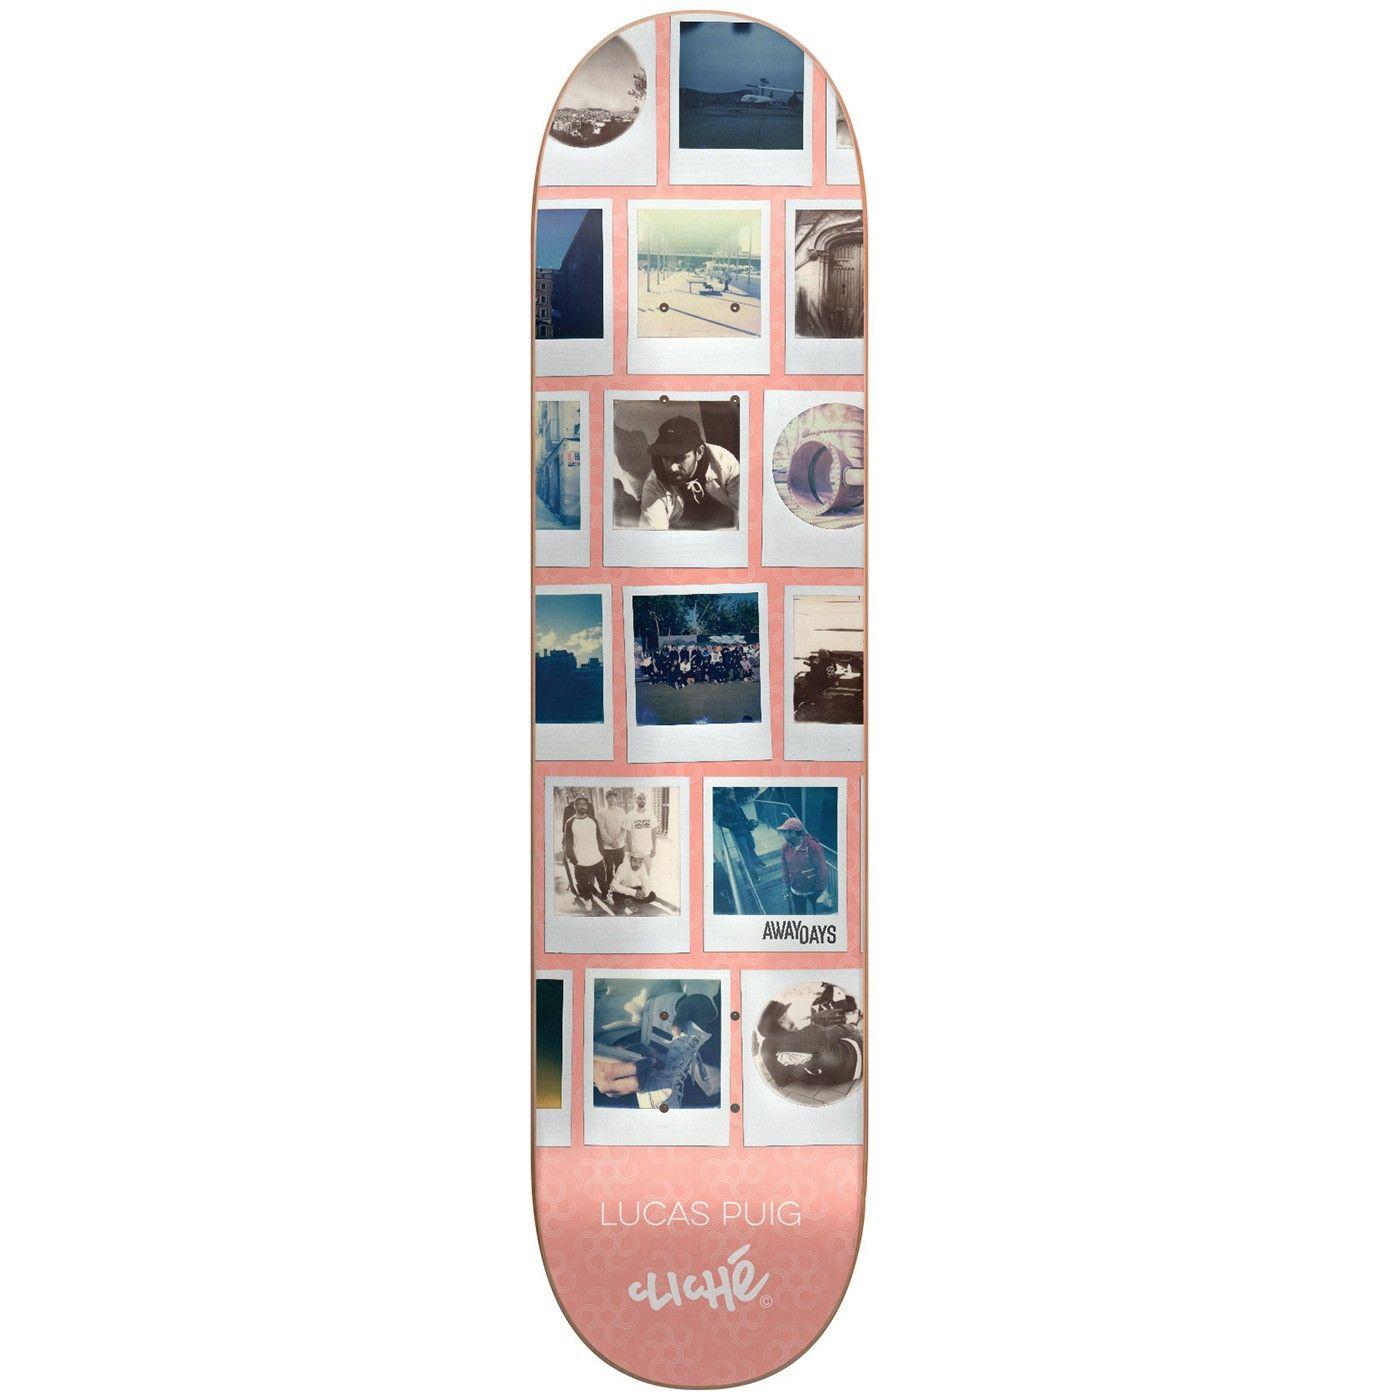 Cliche Skateboards Away Days Lucas Puig Deck in 8 25